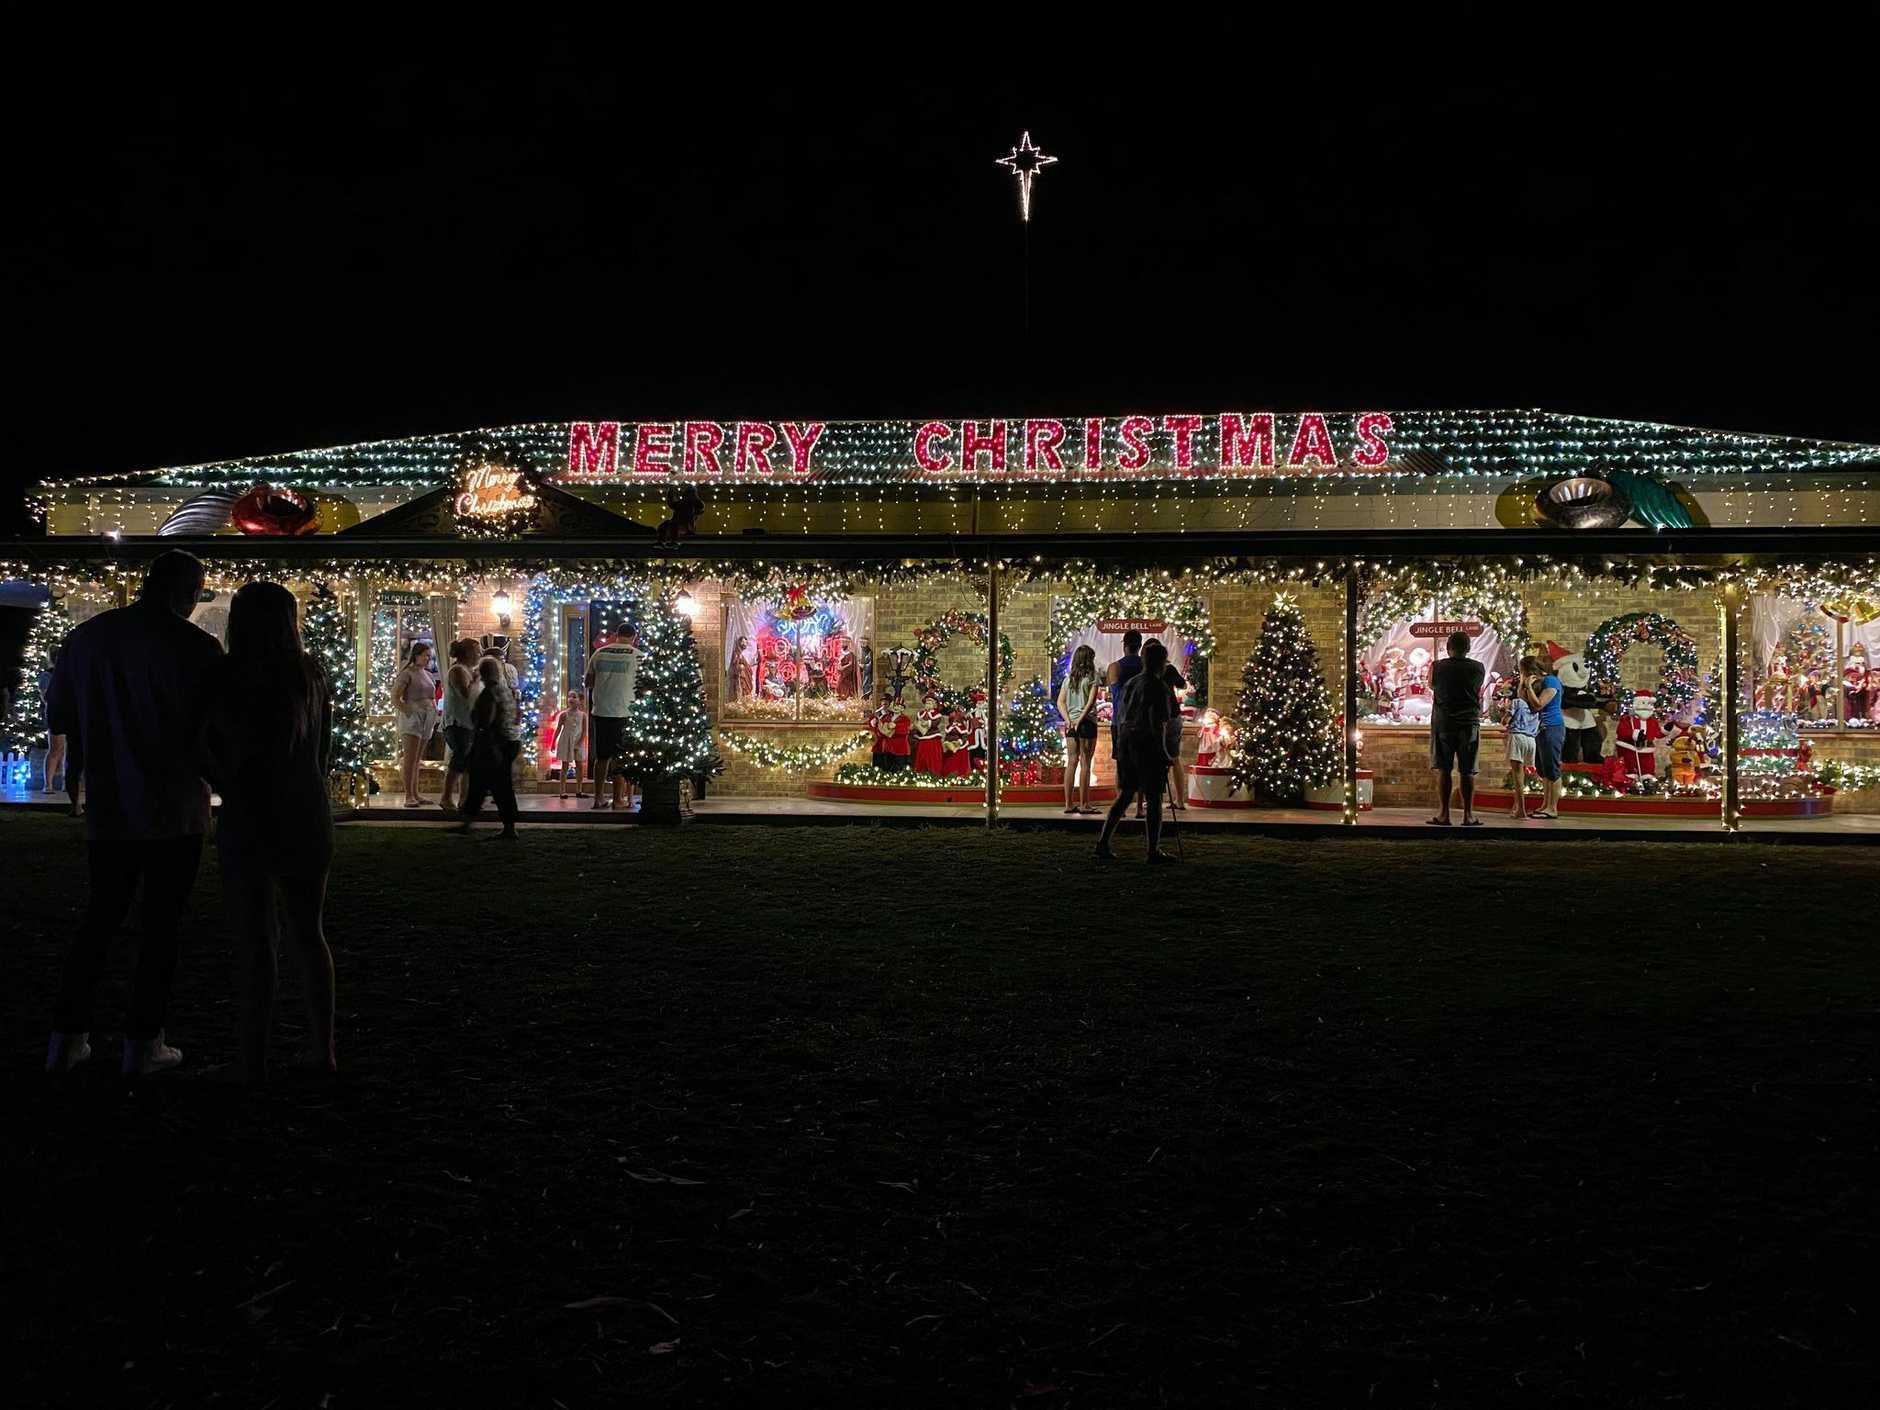 There are some stunning Christmas light displays around the Bundaberg region this year.